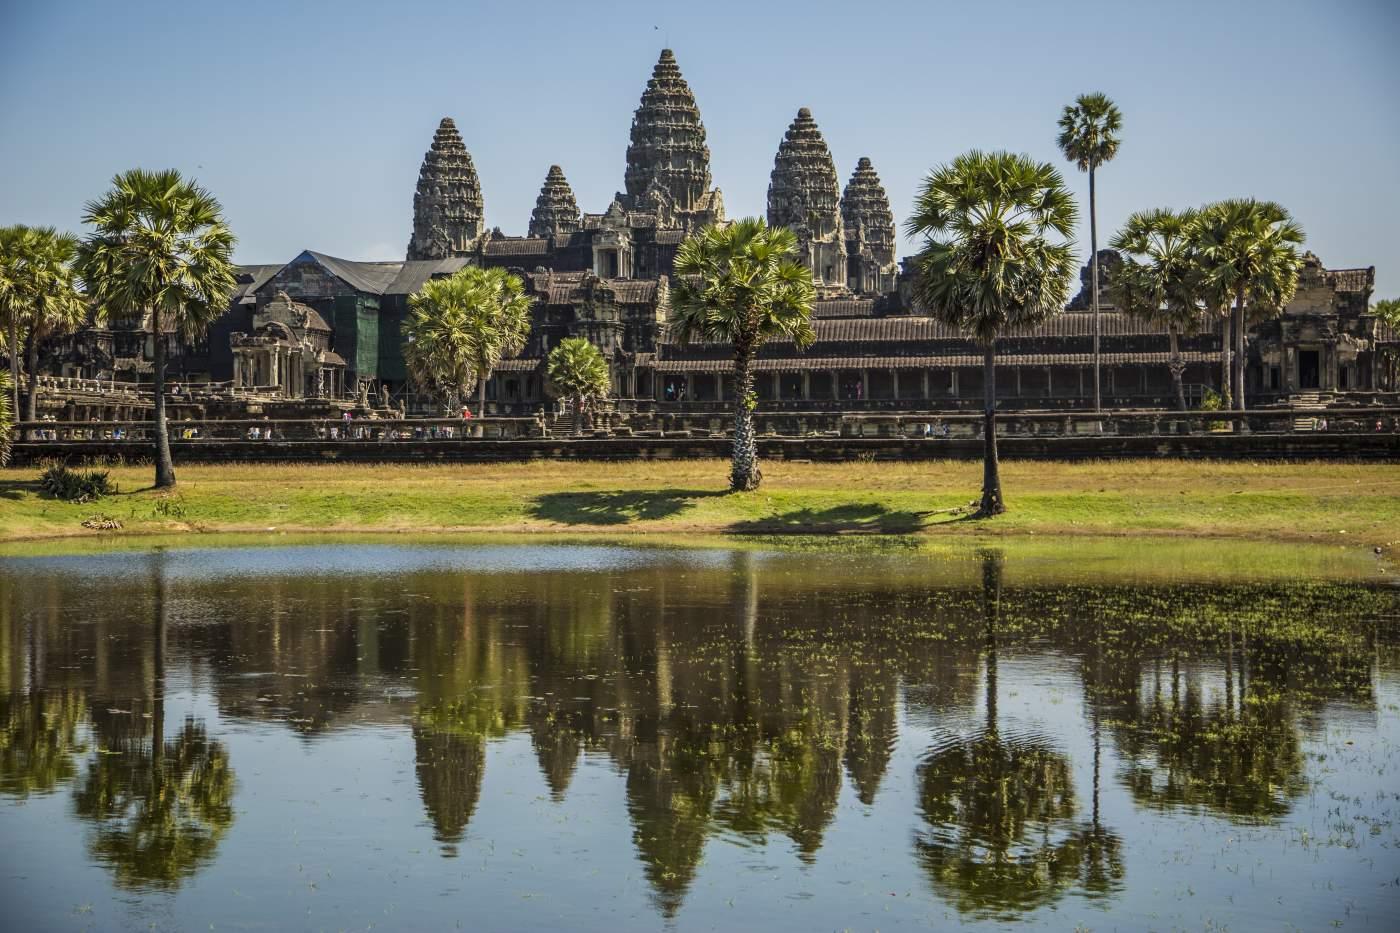 Ankor Wat Kambodscha Tempelanlage Reise Urlaub Motorrad